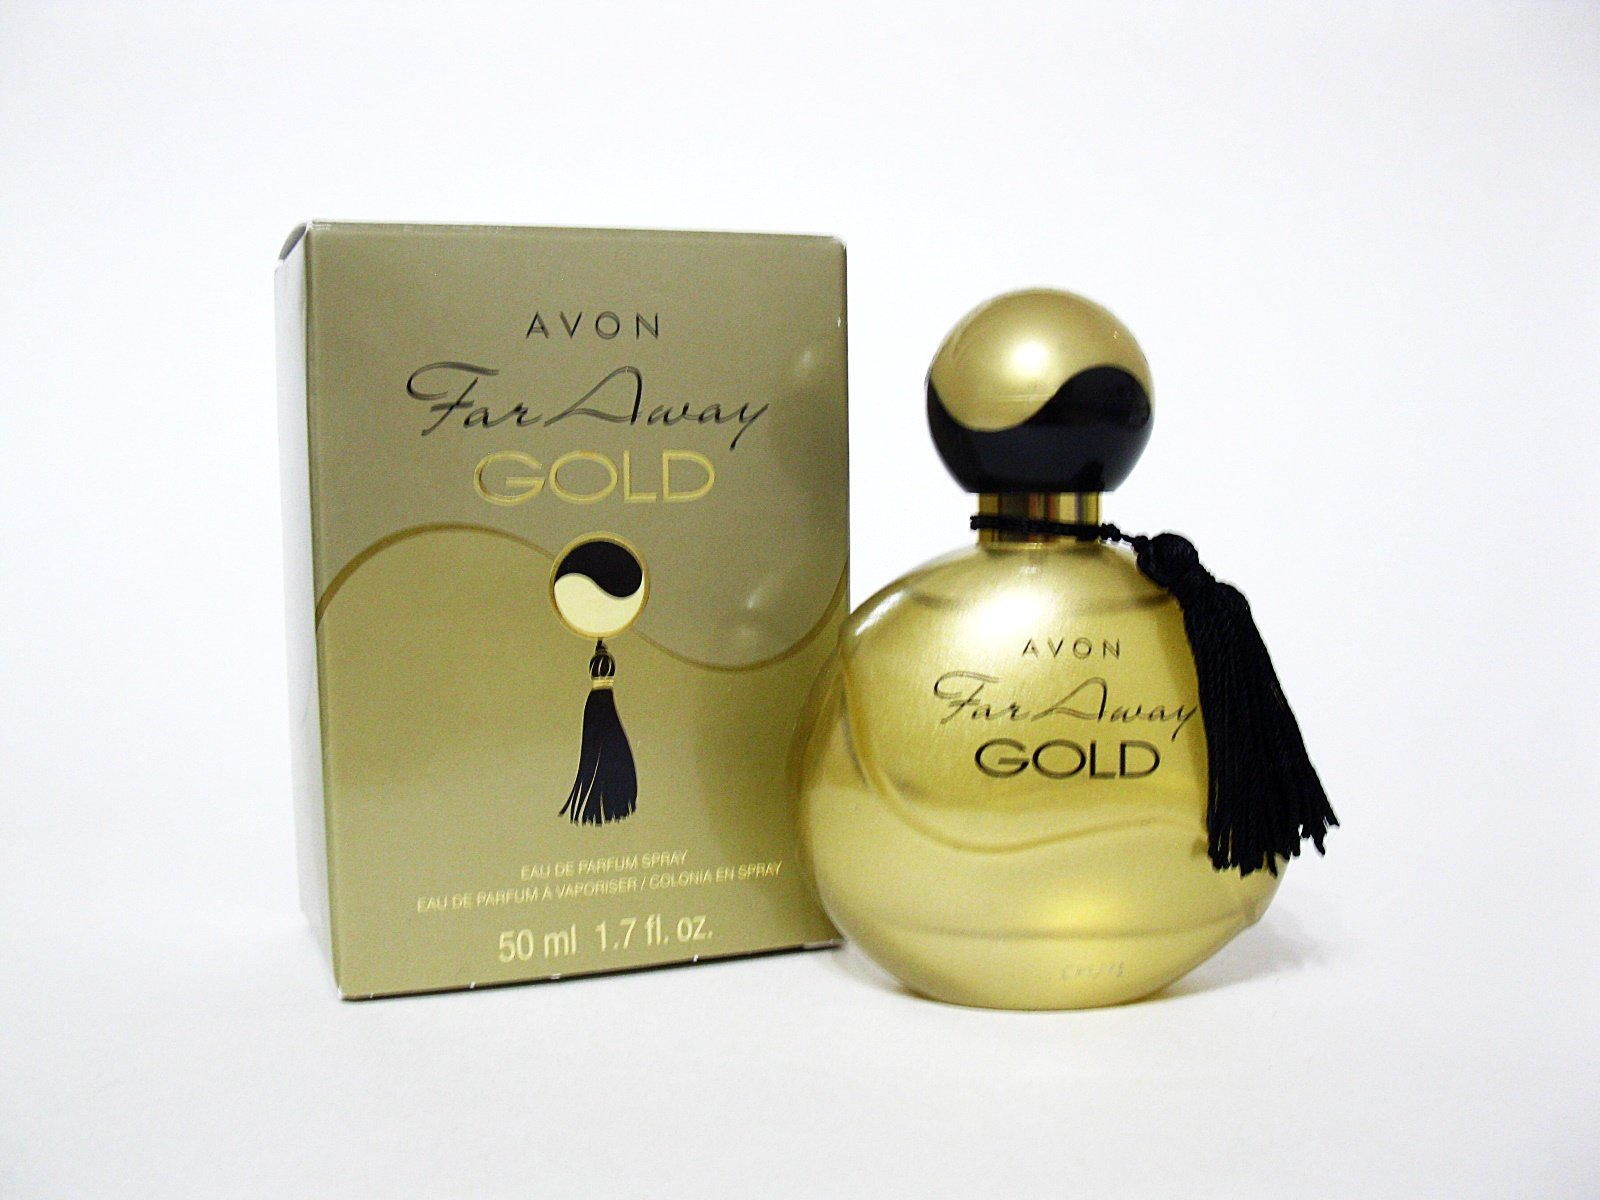 Avon LIMITED-EDITION Far Away Gold Eau de Parfum Spray by Avon